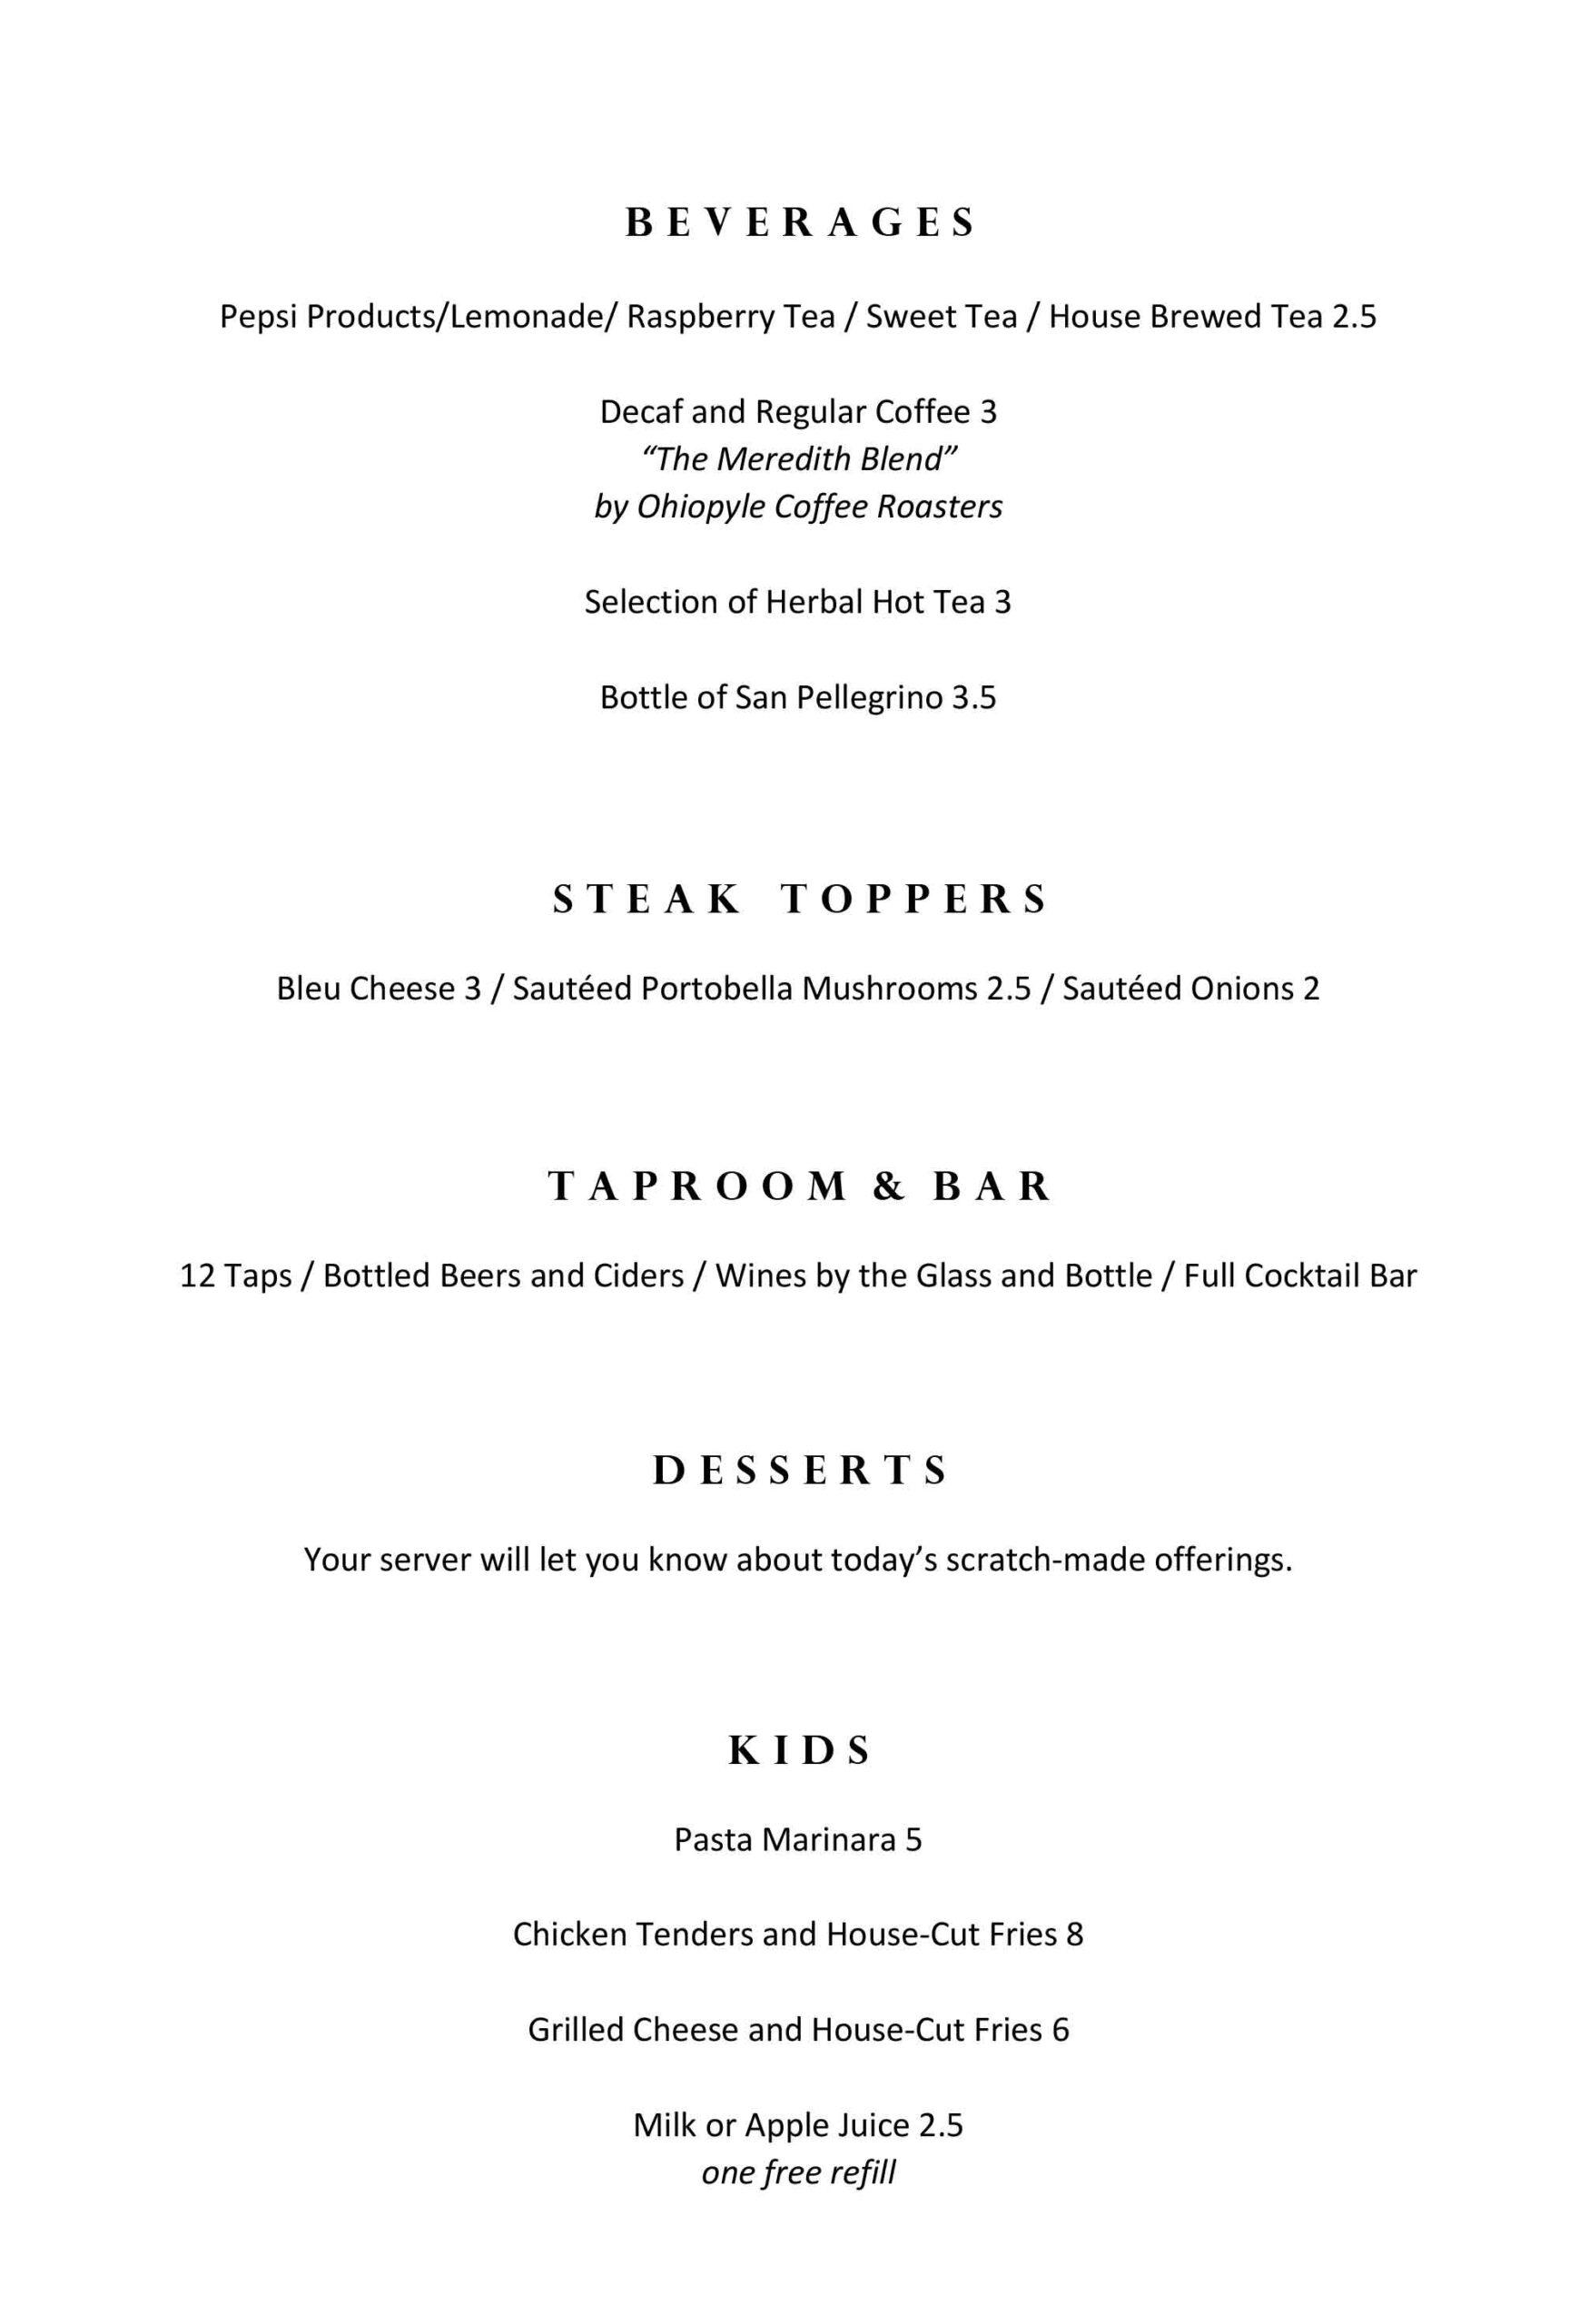 meredith-inn-menu2